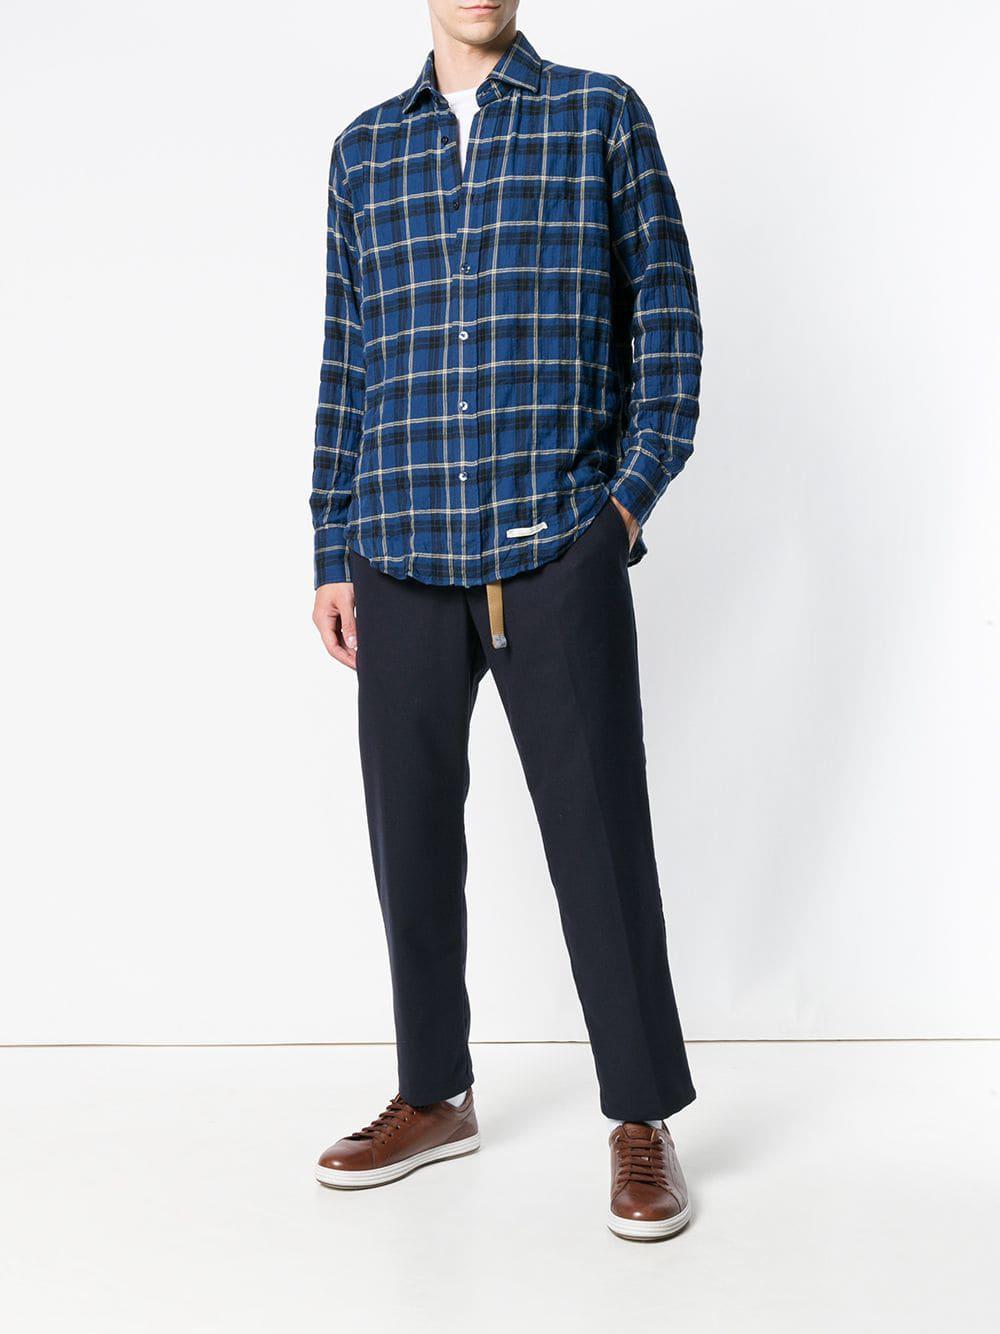 65bb2c2b33 Lyst - Tintoria Mattei Plaid Long-sleeve Shirt in Blue for Men ...